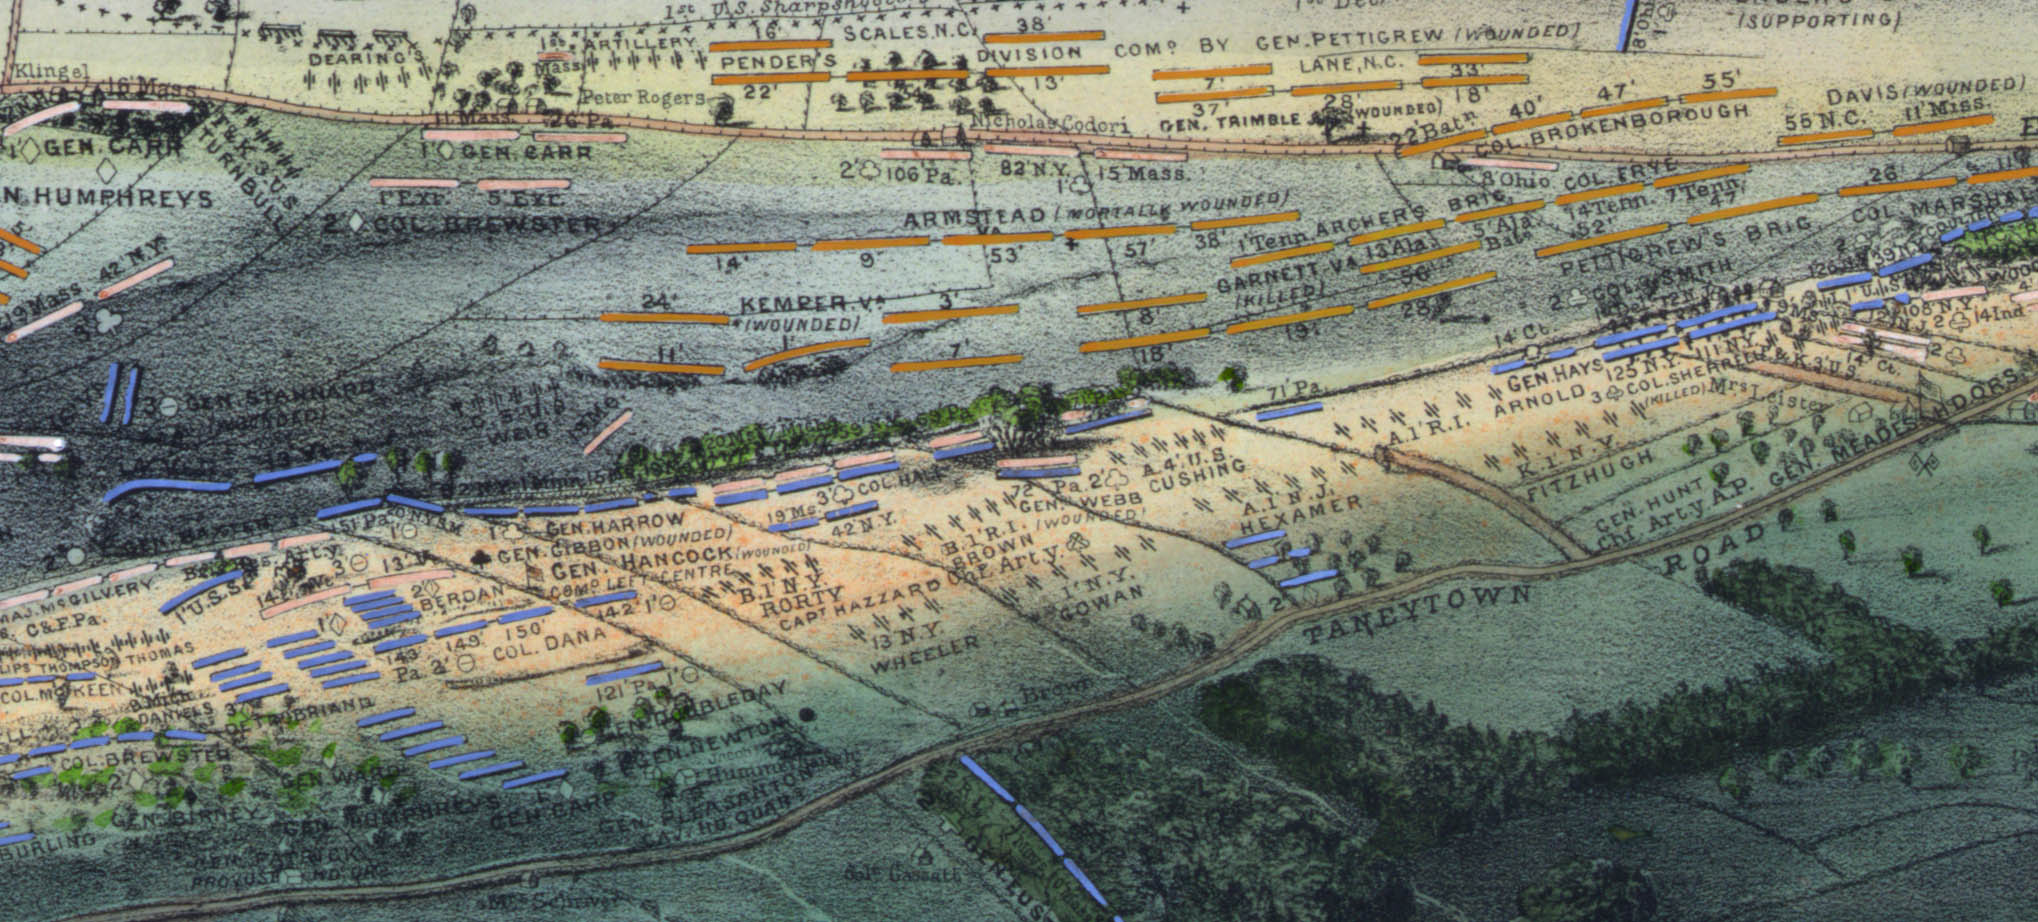 Gettysburg Gettysburg Battlefield Map on seminary ridge, george pickett, pickett's charge, lewis addison armistead, gettysburg national cemetery, gettysburg college map, battle of gettysburg, third day cavalry battles, manassas battlefield park map, little round top map, knights of the golden circle map, day-one gettysburg map, battle of gettysburg, fort necessity national battlefield map, eastern shore of maryland map, battle of gettysburg, second day, cemetery hill, july 1 gettysburg map, devil's den, cemetery ridge map, gettysburg campaign, historic gettysburg map, gettysburg cyclorama, gettysburg wheatfield map, eternal light peace memorial, 1st day gettysburg map, barlow knoll gettysburg map, civil war 1863 gettysburg map, battle of gettysburg, first day, gettysburg campaign map, big round top, cemetery ridge, gettysburg town map, richmond national battlefield park map, lee's retreat from gettysburg map, little round top, pickett's charge at gettysburg map, bull run map, gettysburg address, gettysburg national tower, gettysburg museum and visitor center,